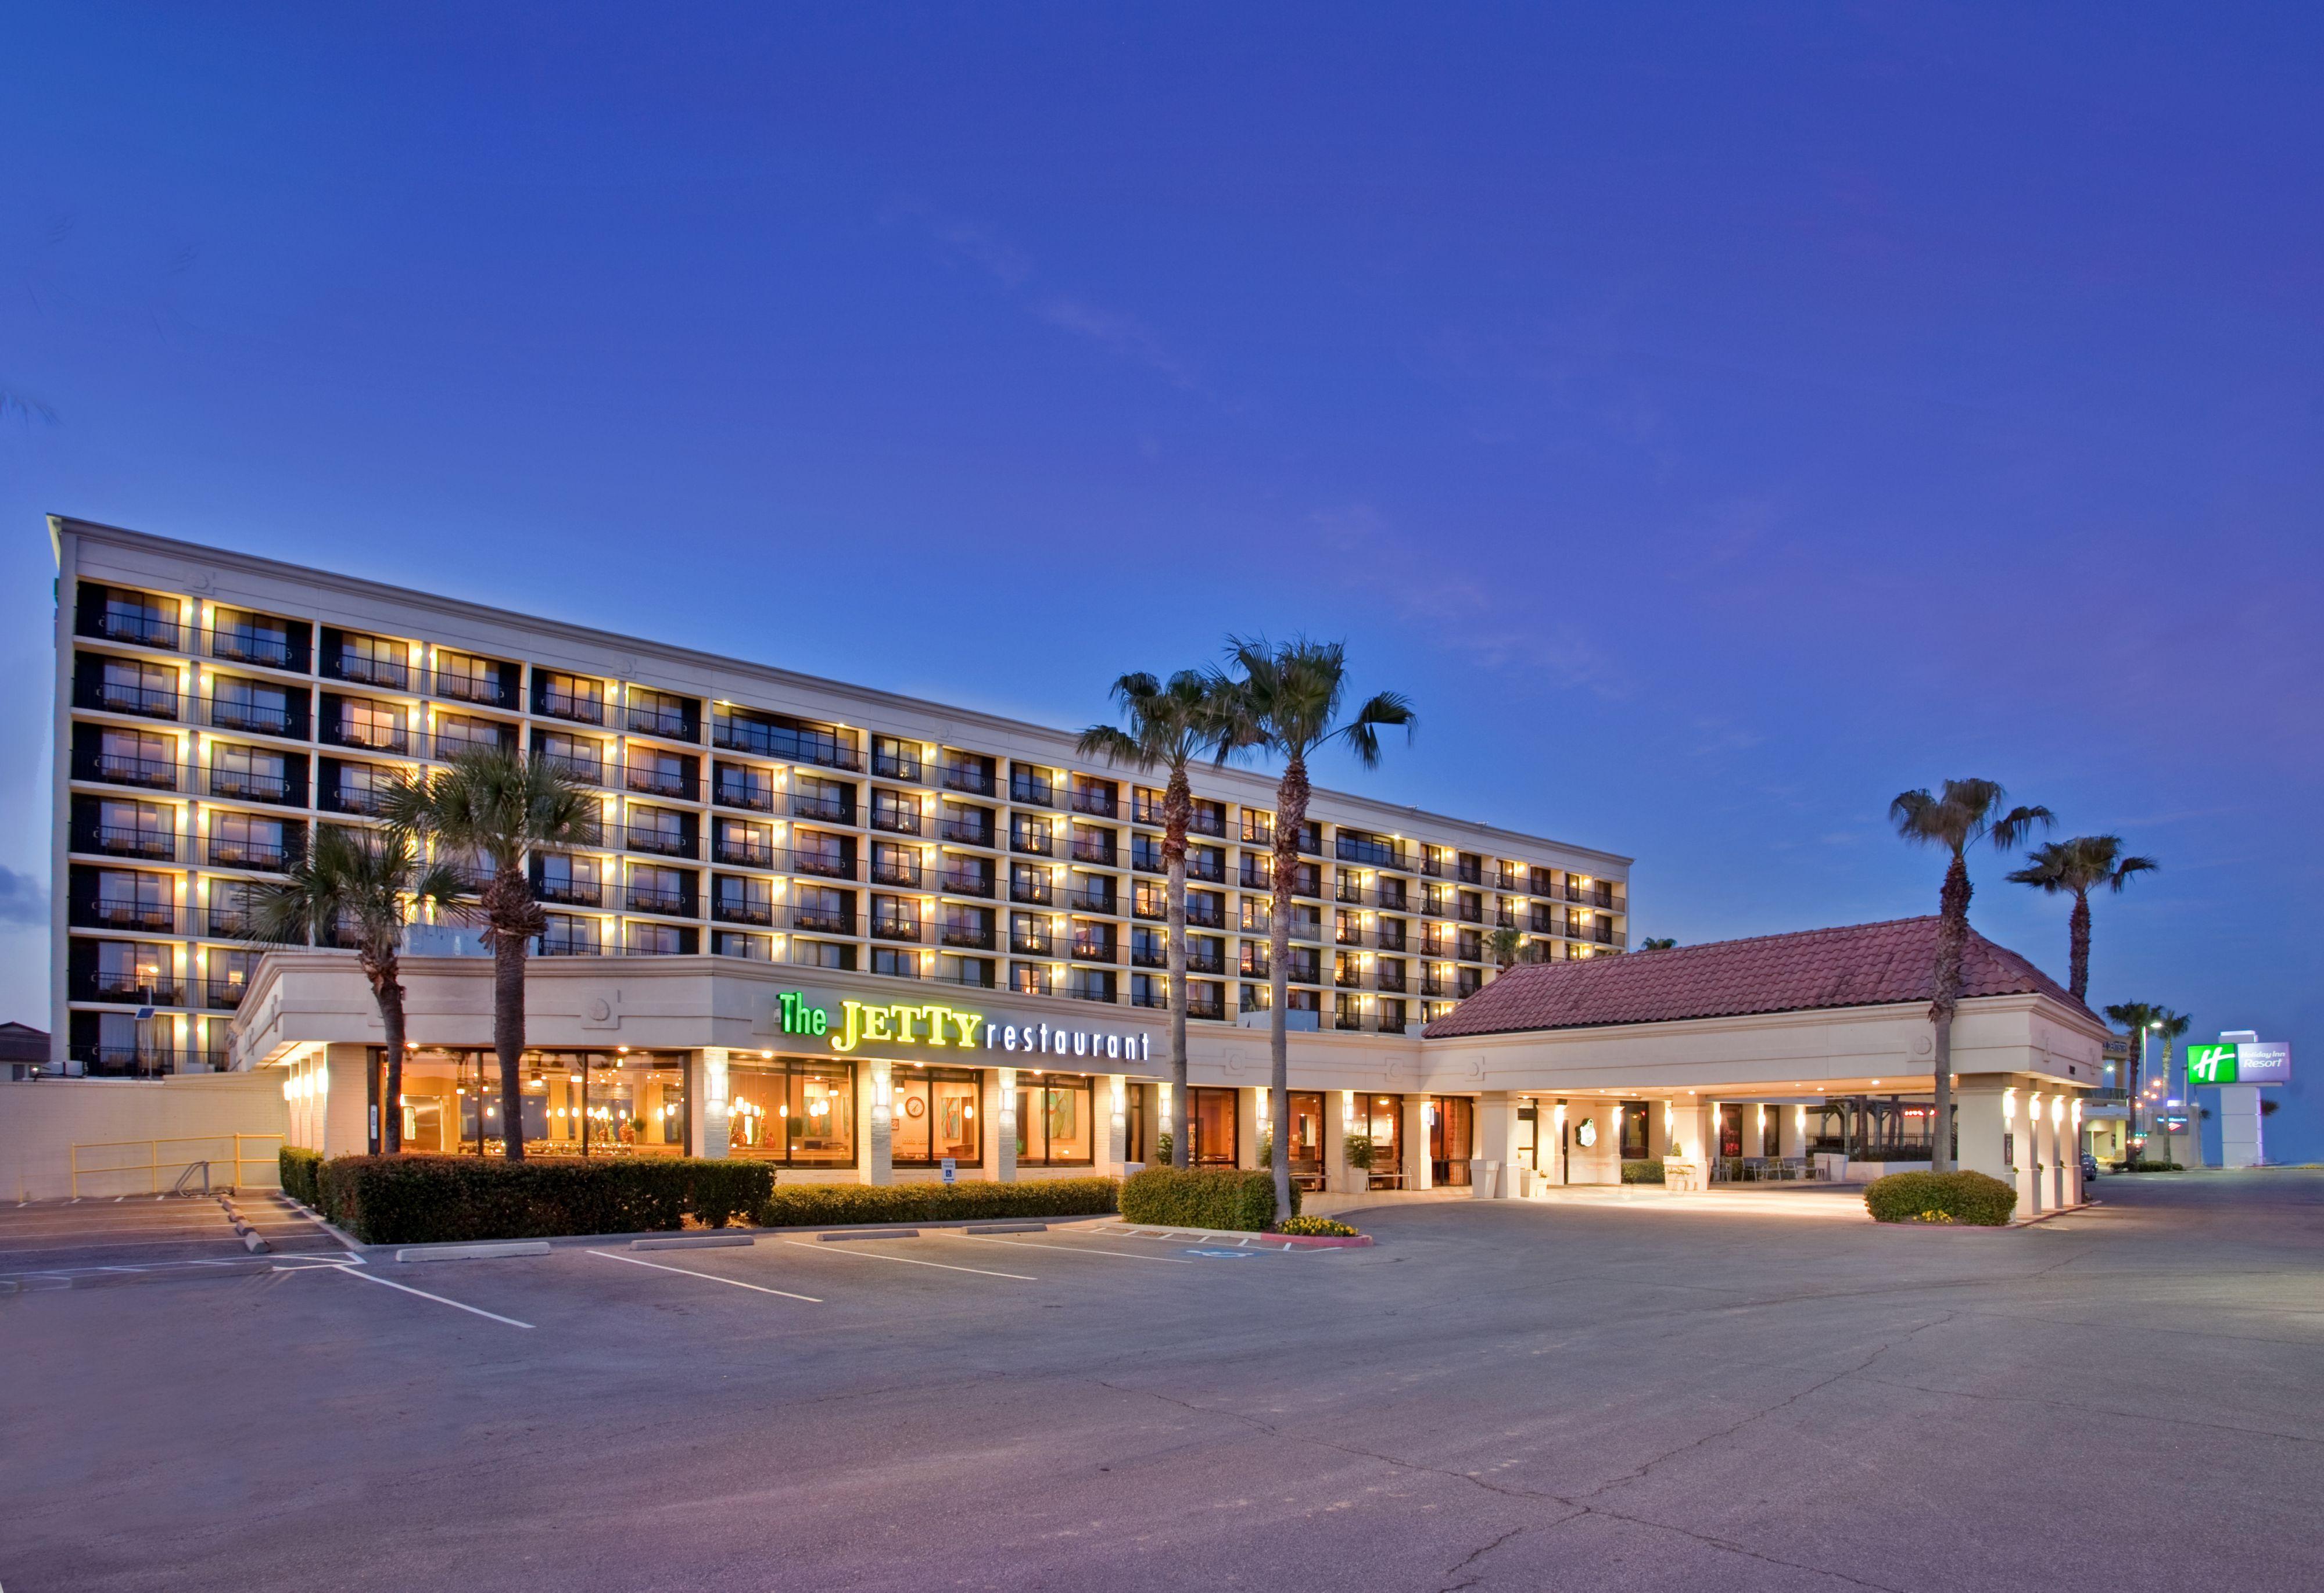 Galveston Tx Motels On The Beach